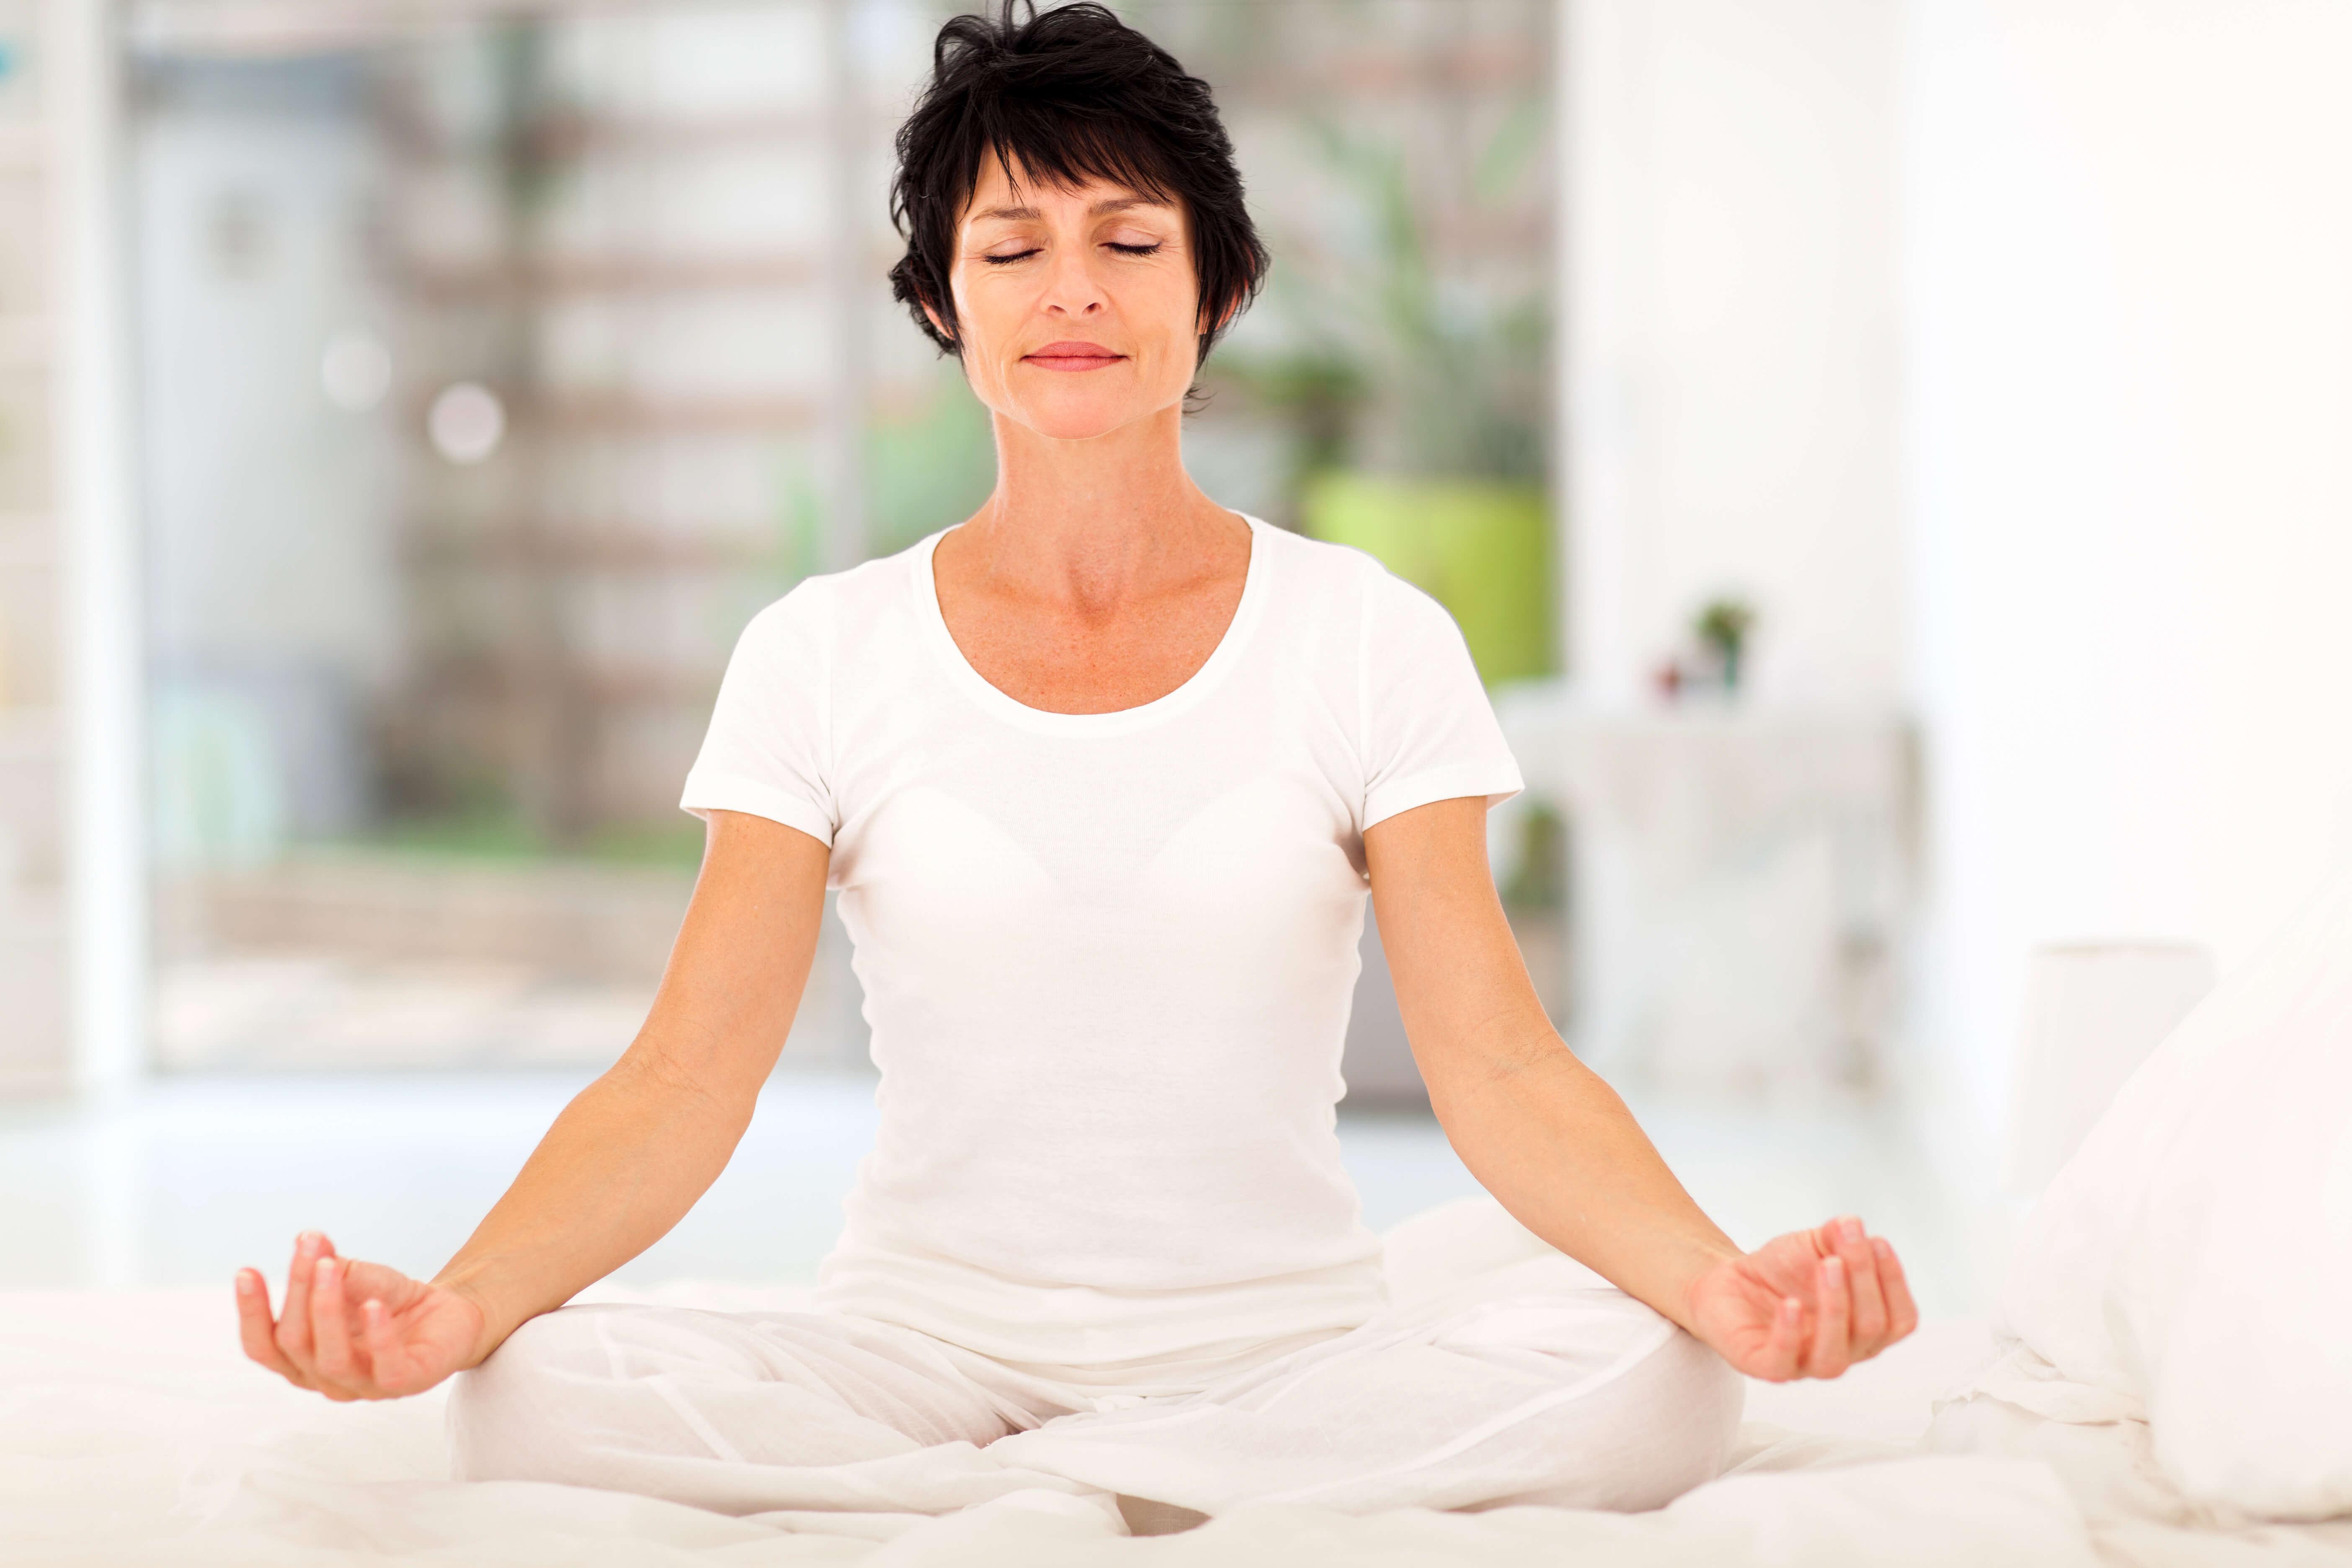 Women meditating on bed